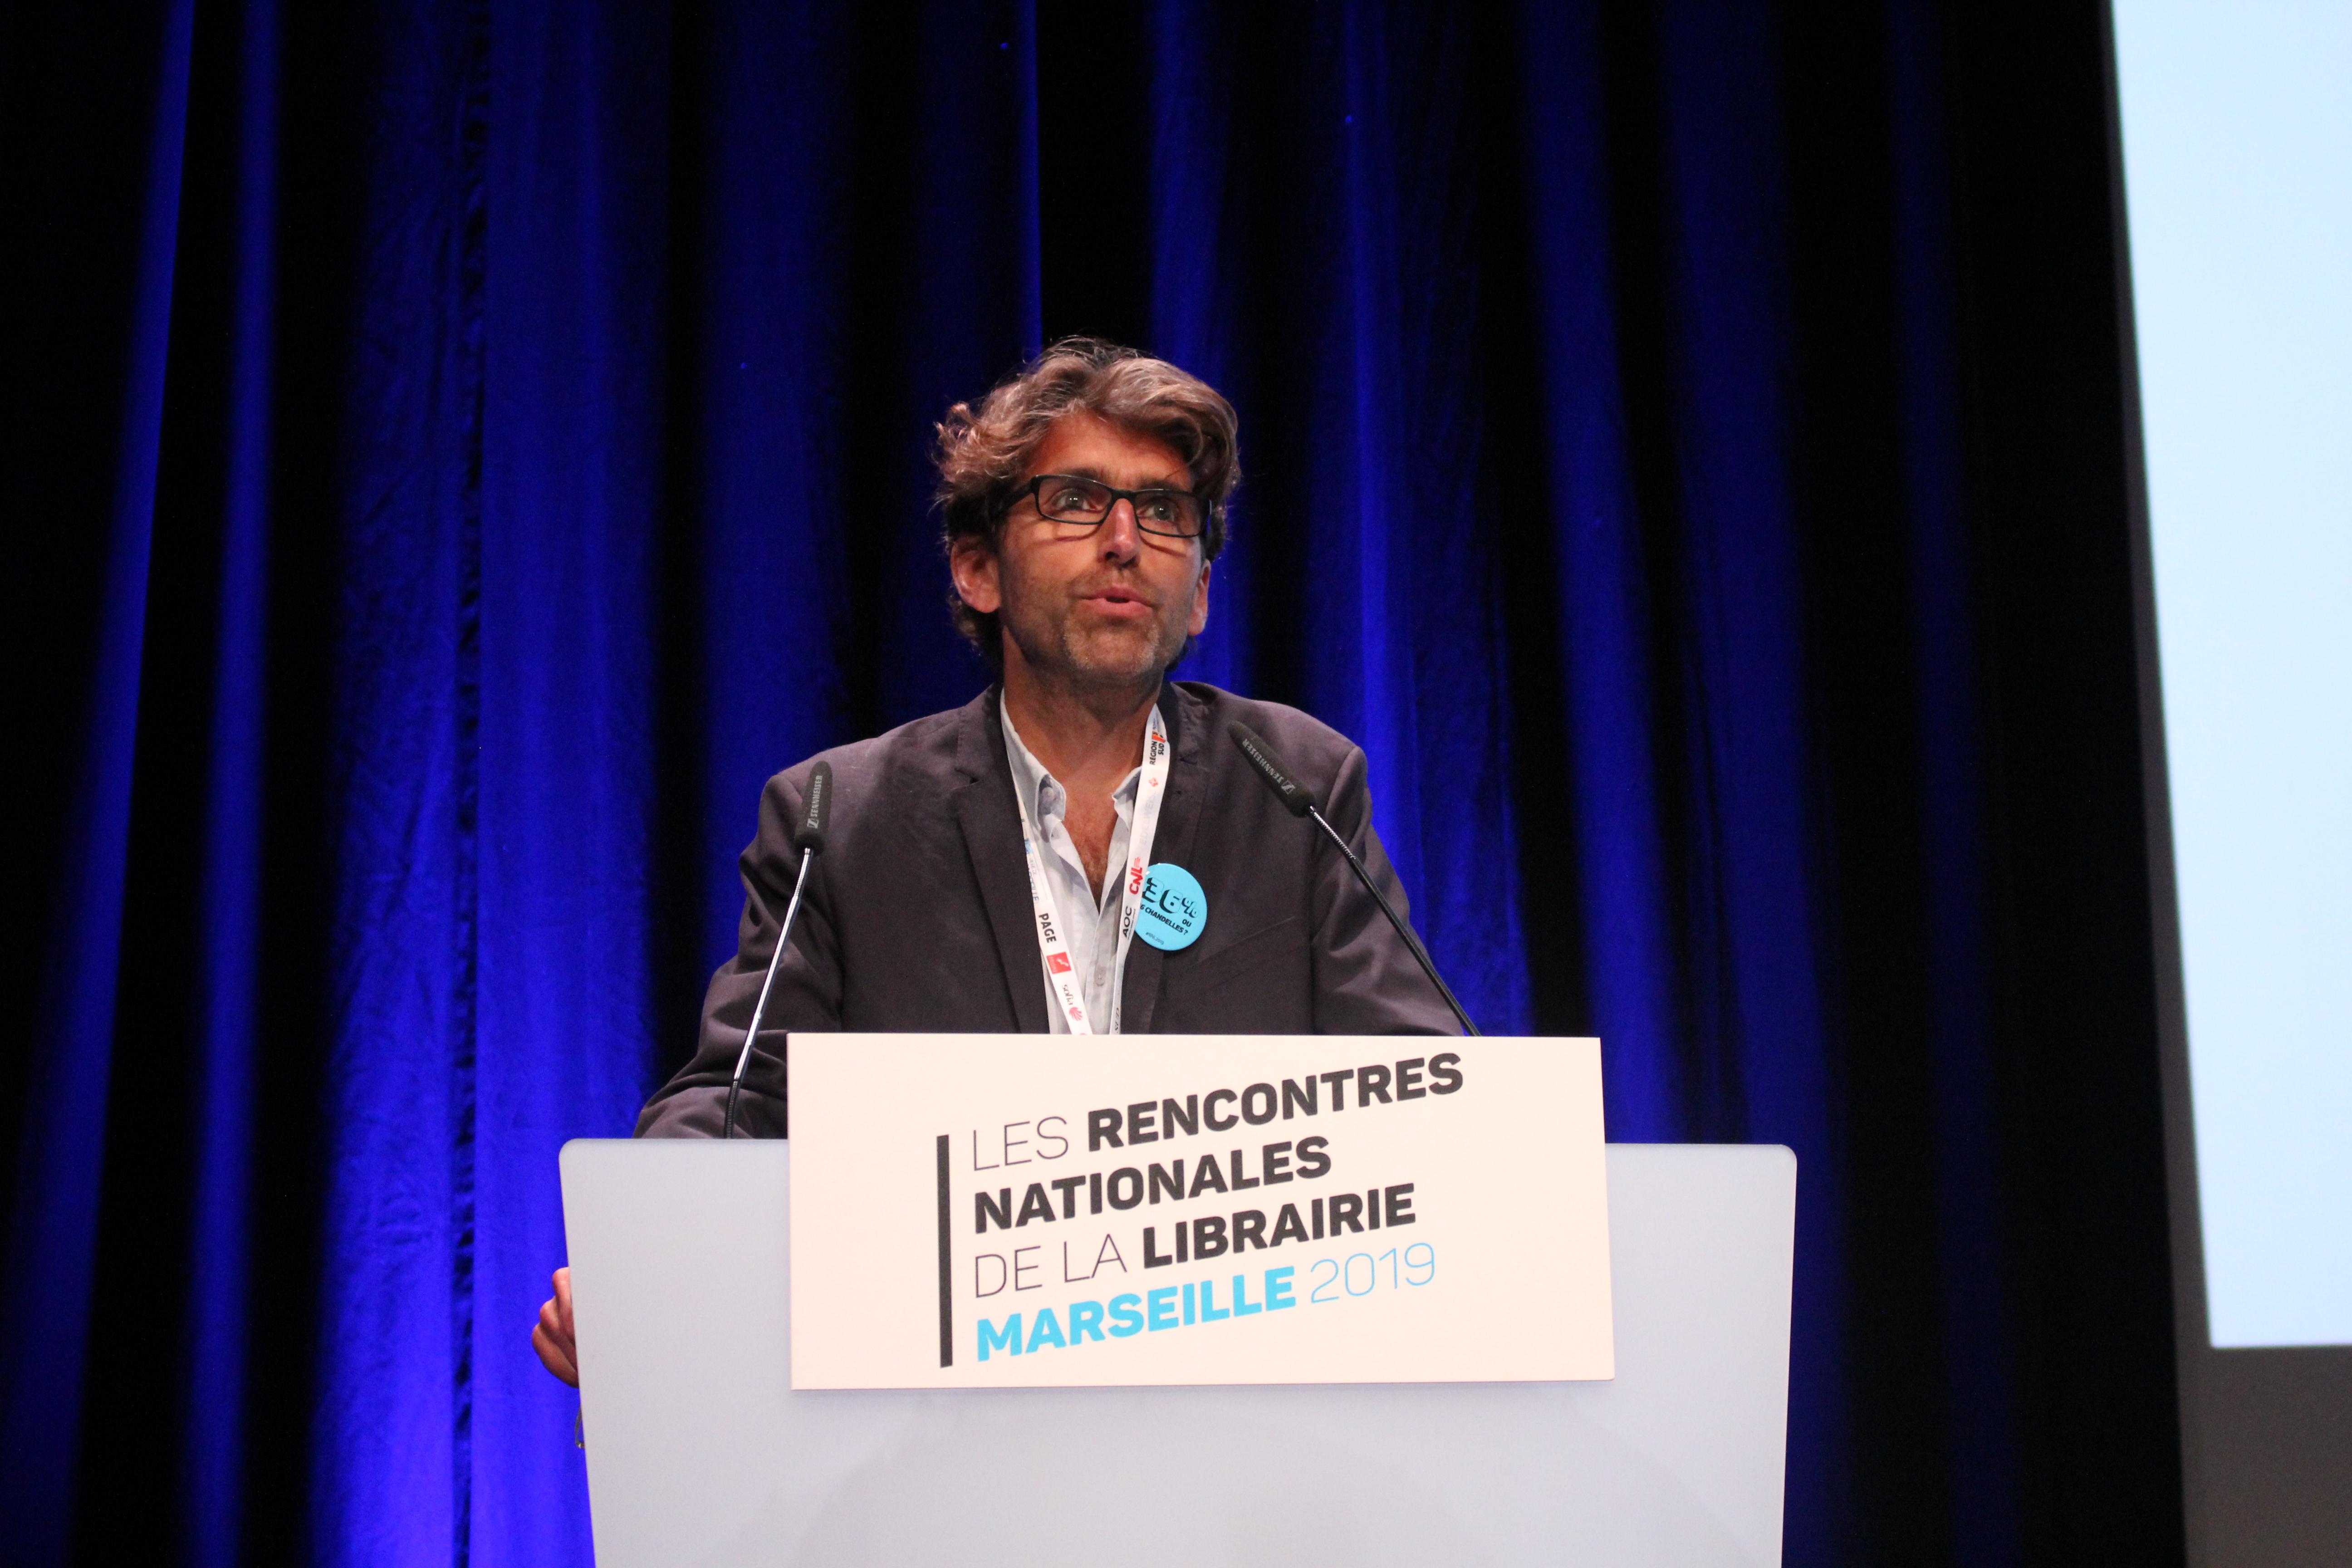 Job Rencontres Lyon et Marseille